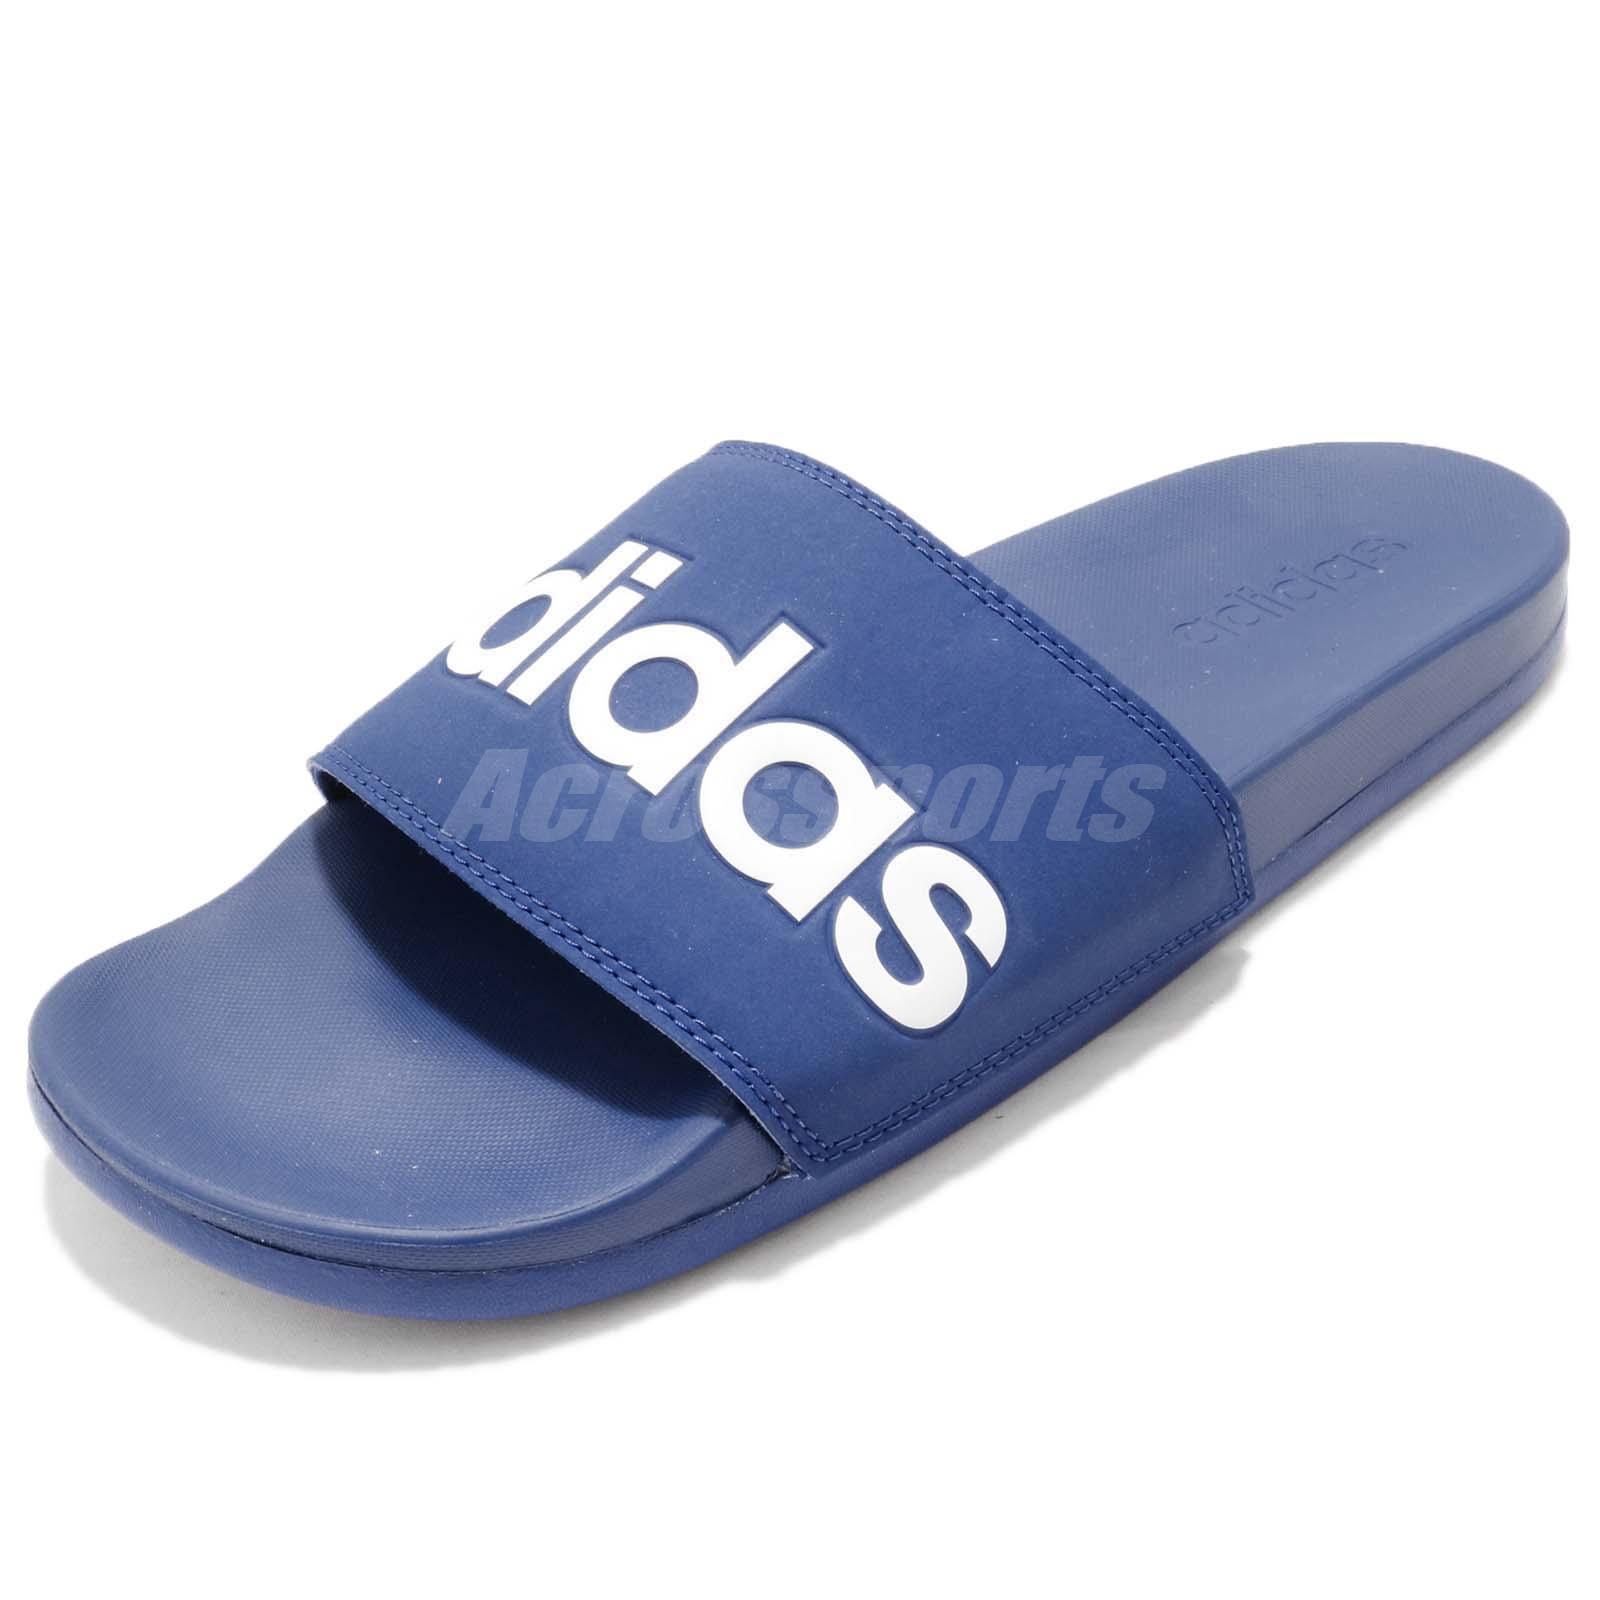 ac0a3736168cd4 adidas Adilette Comfort Blue White Men Sports Sandals Slides Slippers B42208